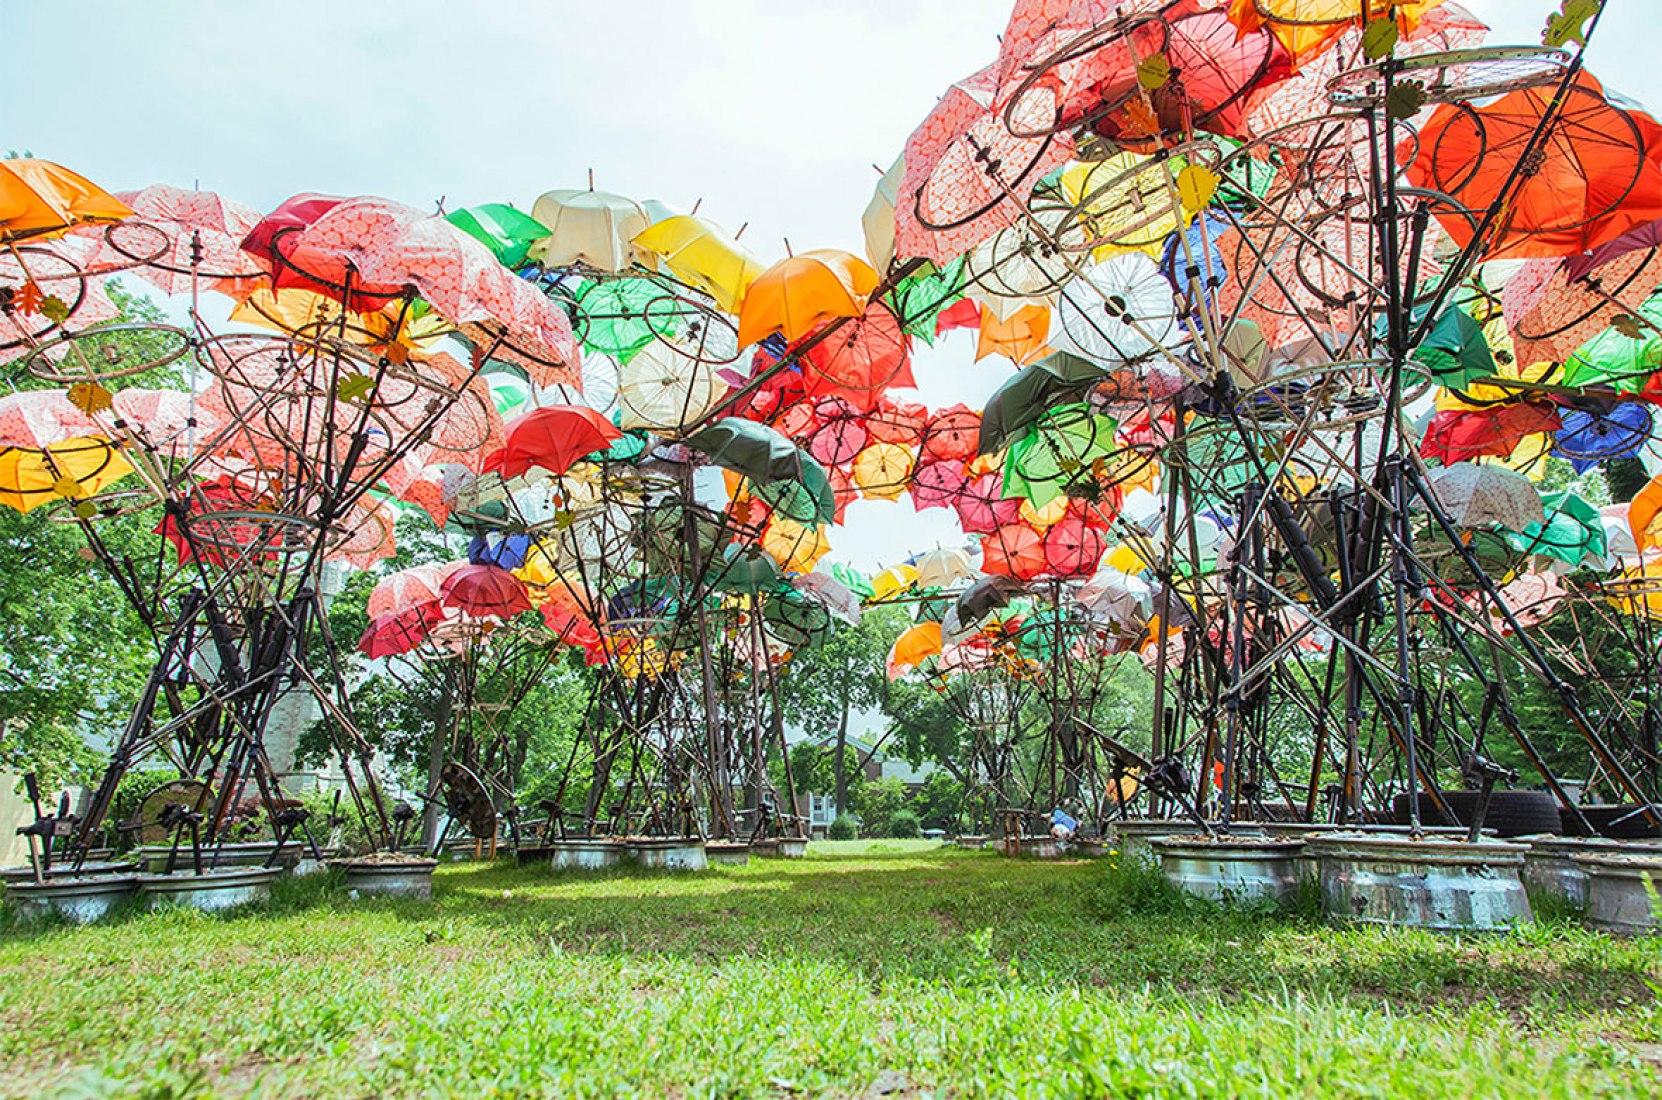 Organic Growth Pavilion by Izaskun Chinchilla Arquitectos. Photography © Sergio Reyes.